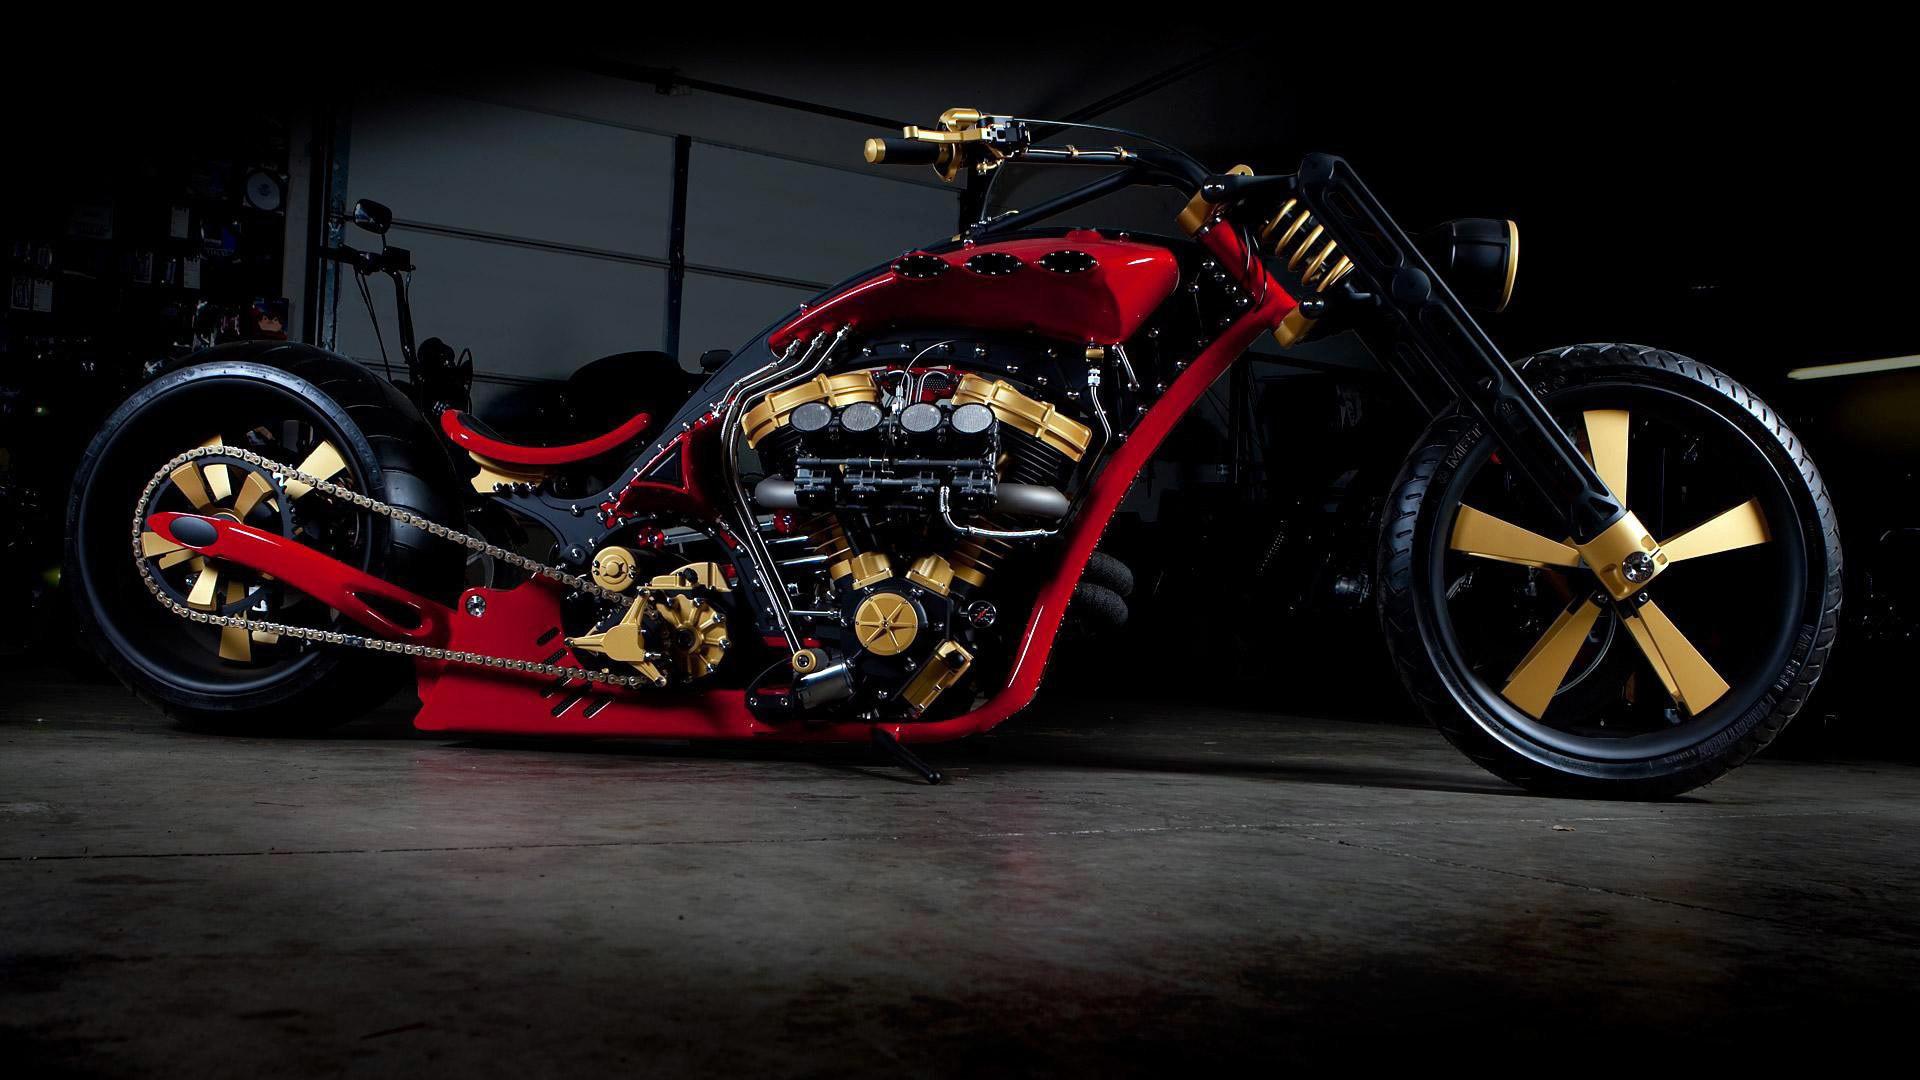 Vehicles - Chopper Motorcycle Custom Wallpaper